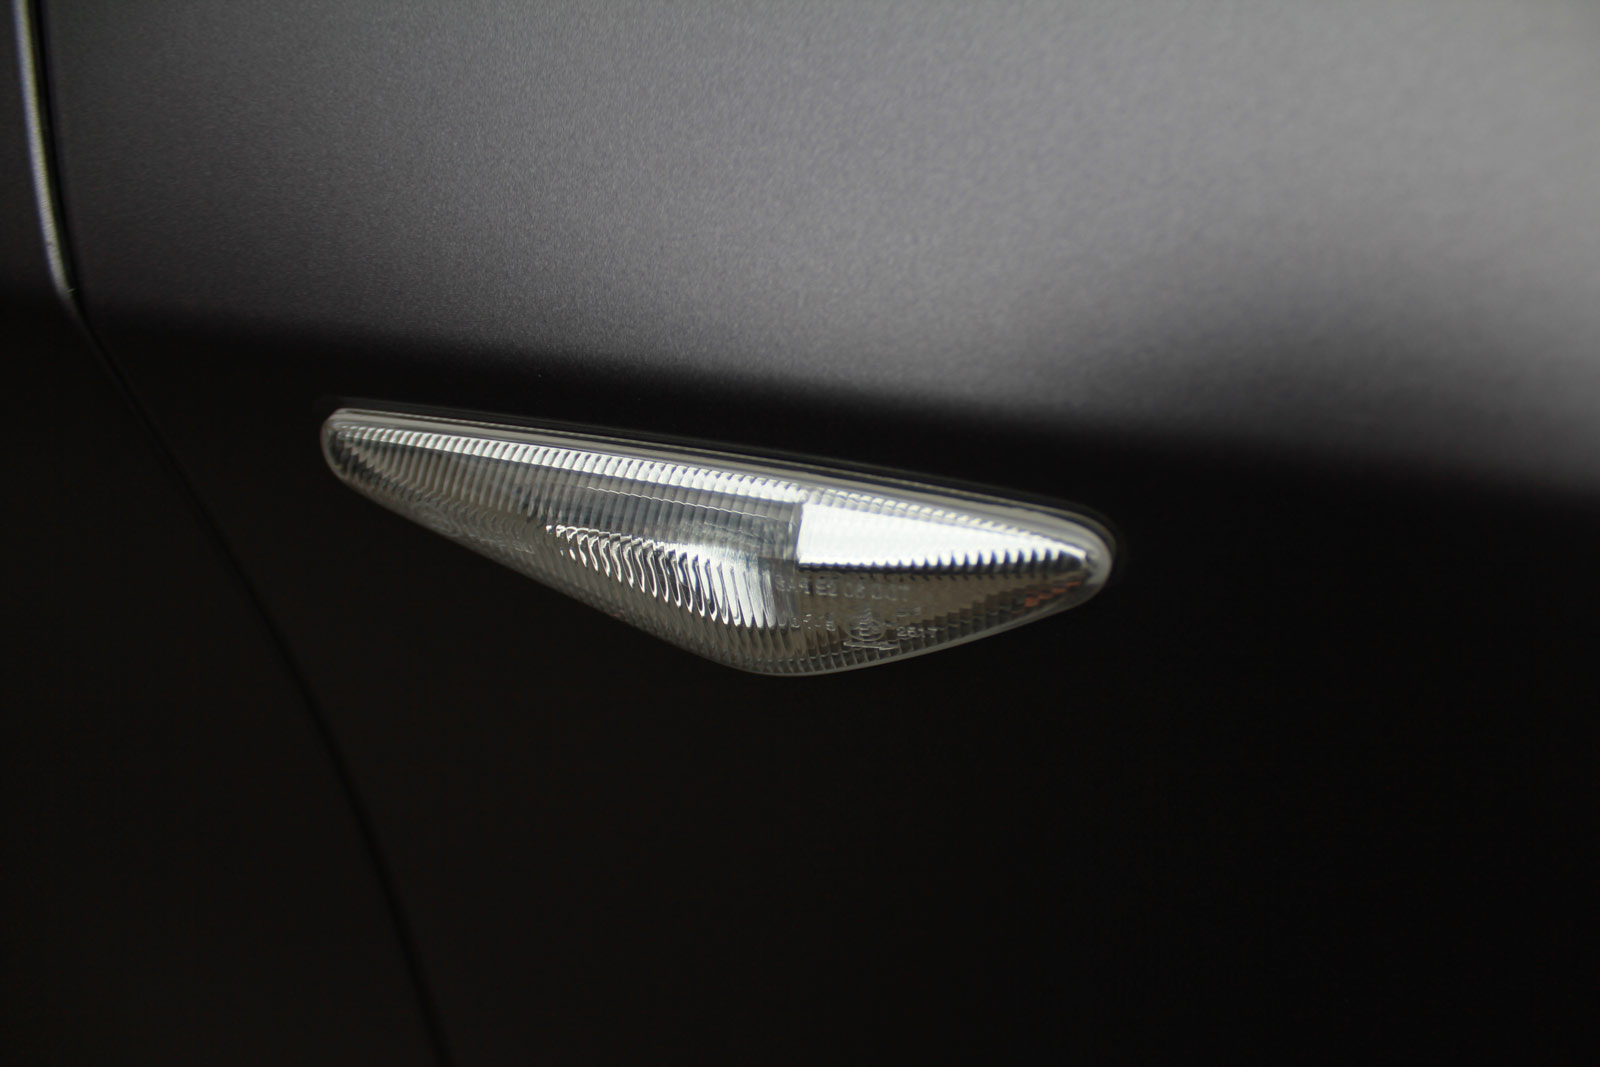 BMW_X6_Folierung_Anthrazit_Metallic_Matt_15